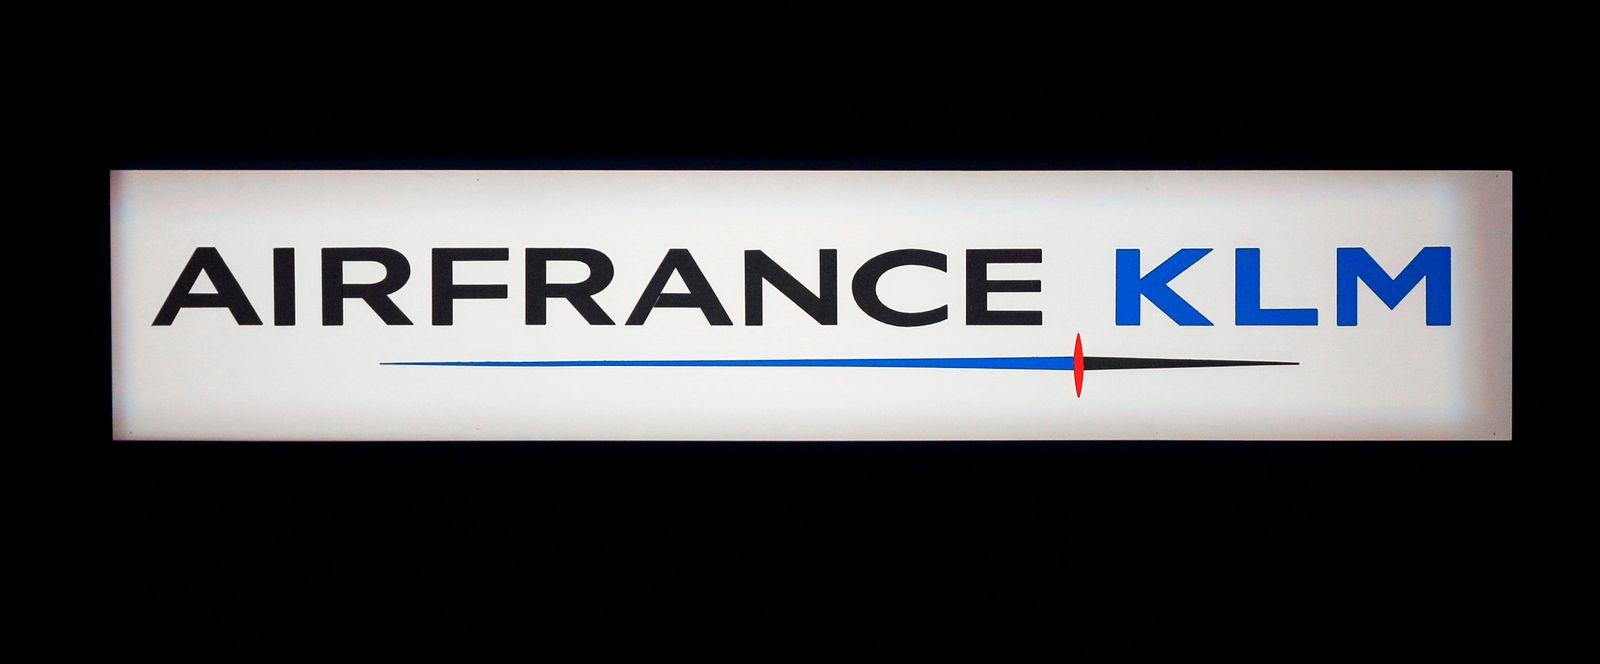 FILES-FRANCE-NETHERLANDS-AIRFRANCE-KLM-AVIATION-HEALTH-VIRUS